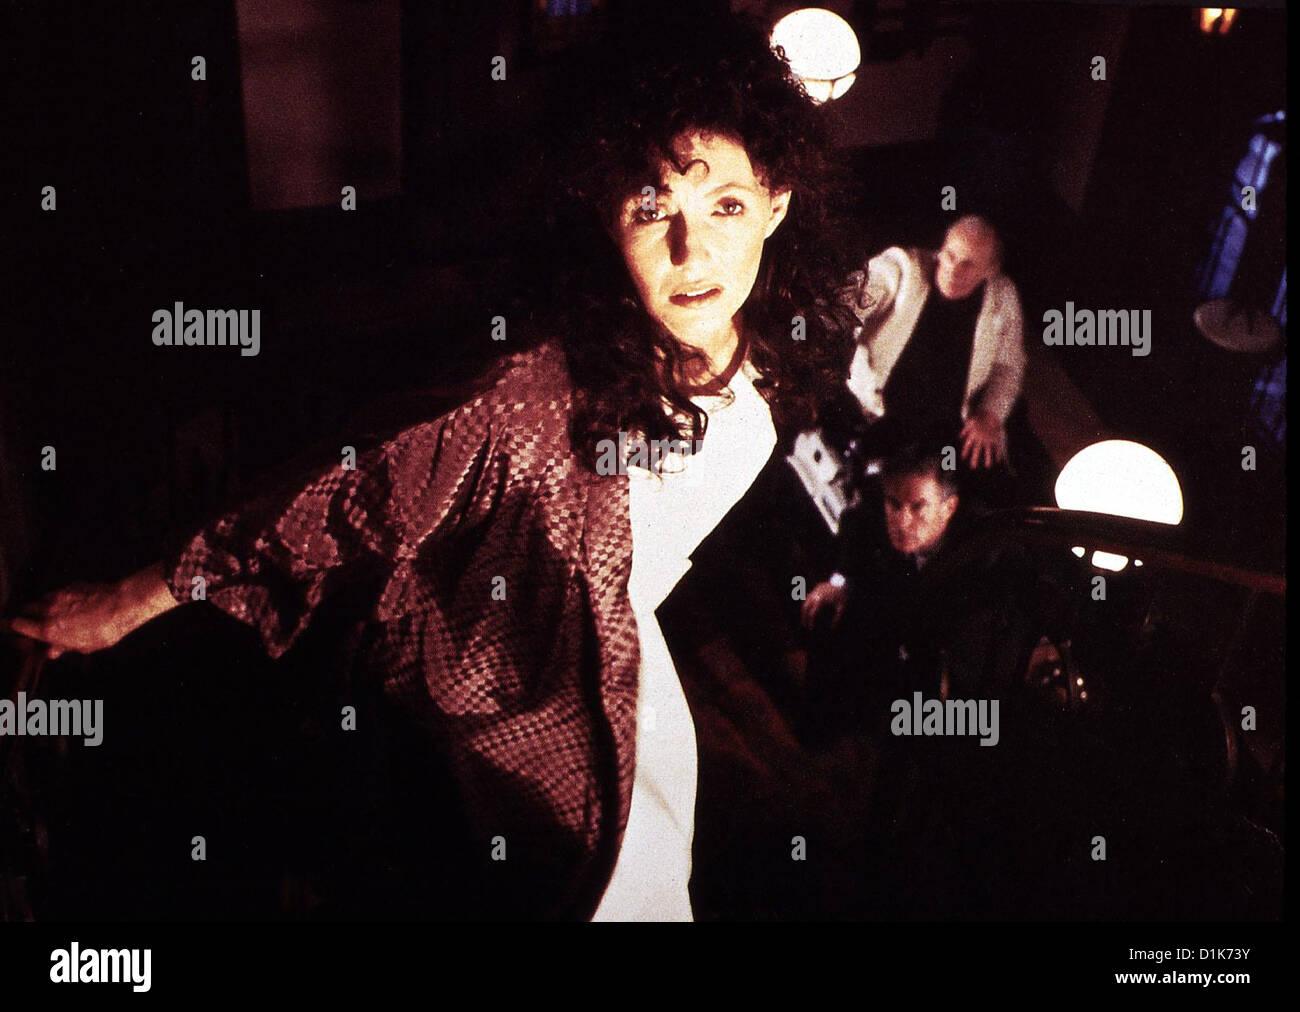 dead of winter 1987 download